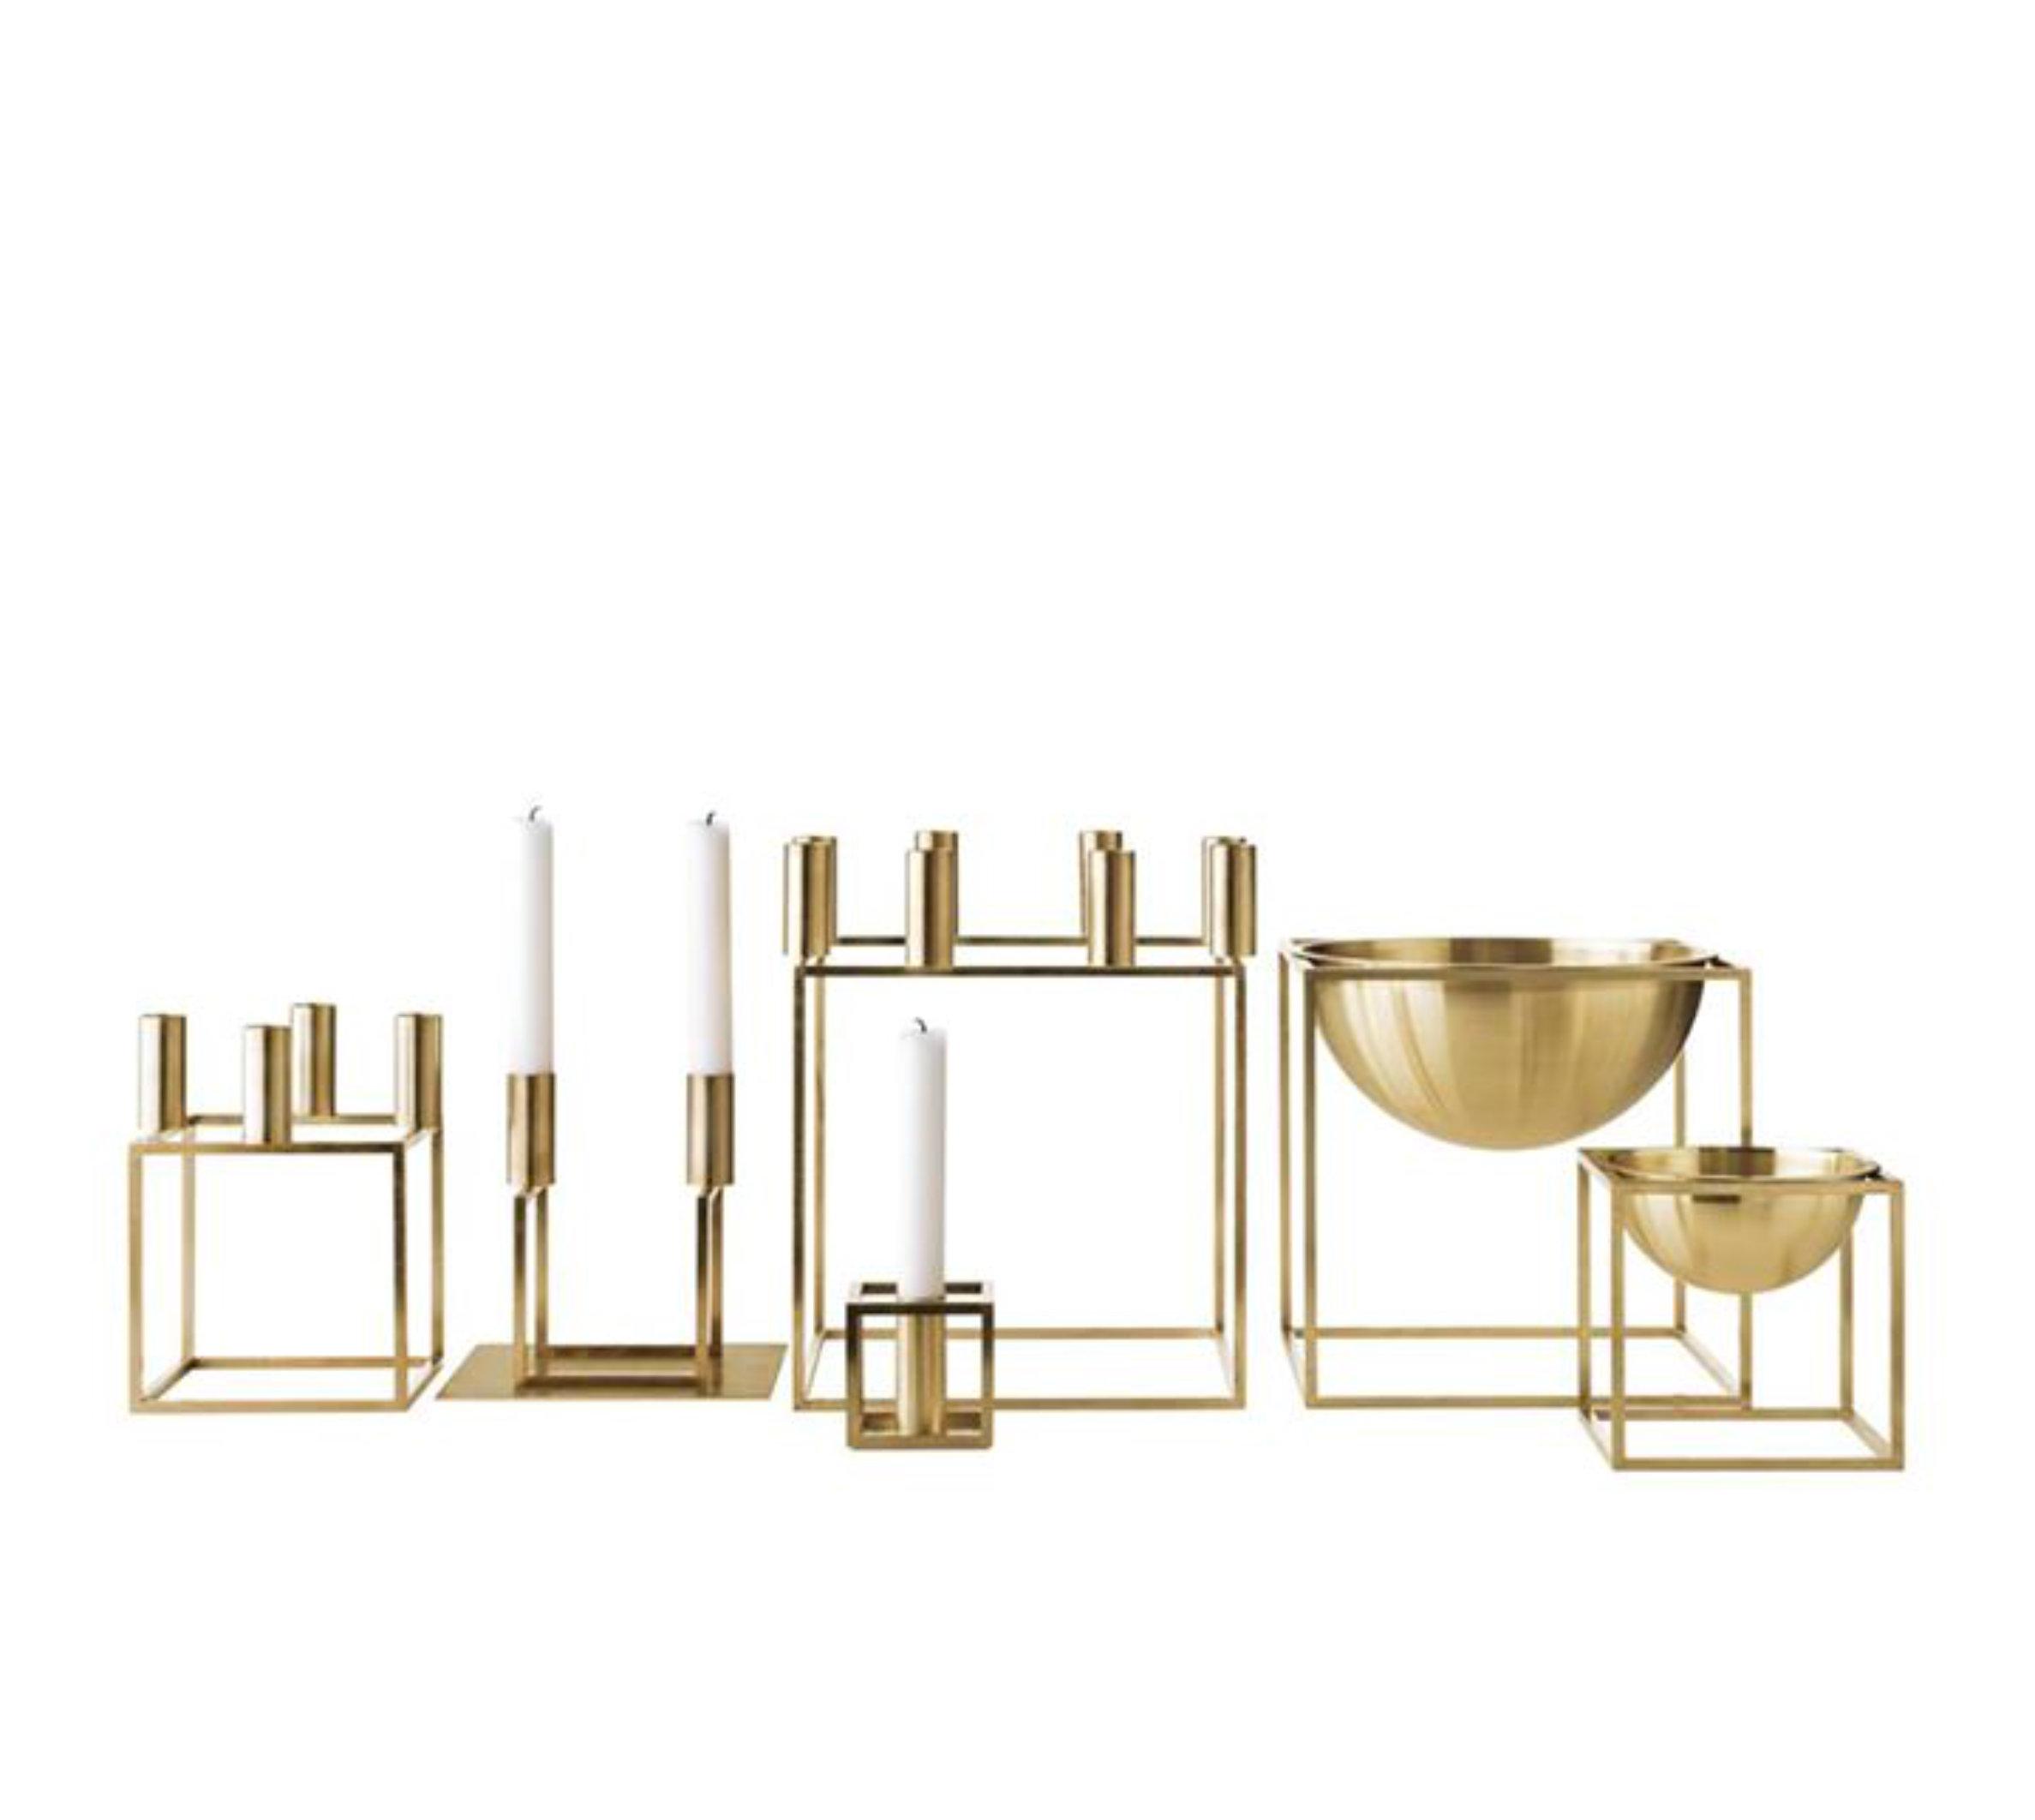 interiorlines_new_products_bylassen_kubus_brass_1.jpg